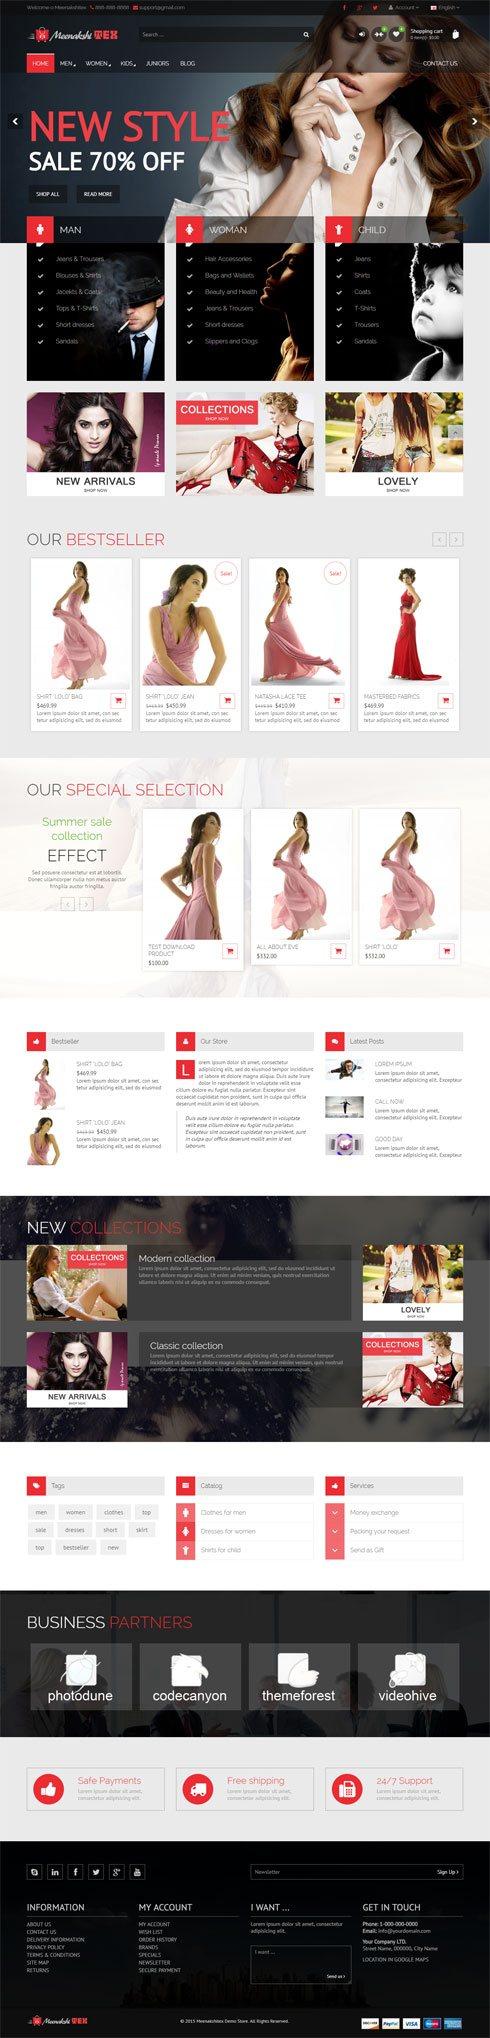 Meenakshitex Demo Store India Web Design